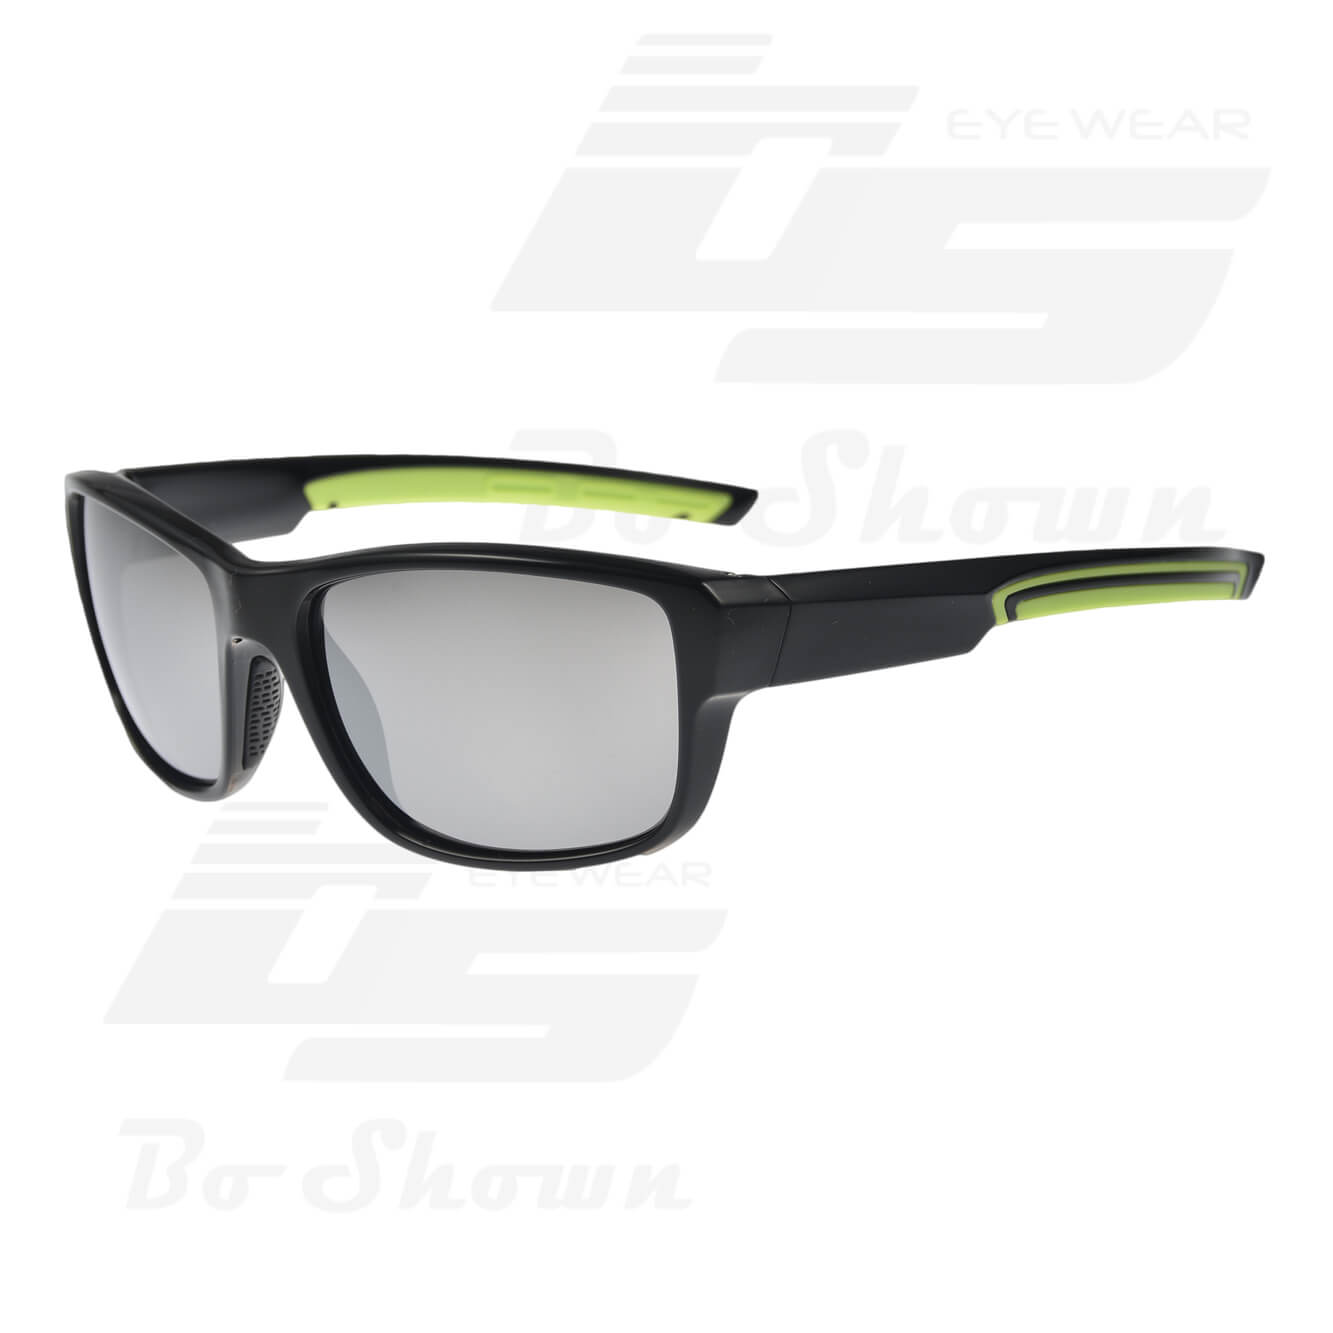 0a344291148bb Lifestyle Sunglasses 270 - BO SHOWN EYEWEAR